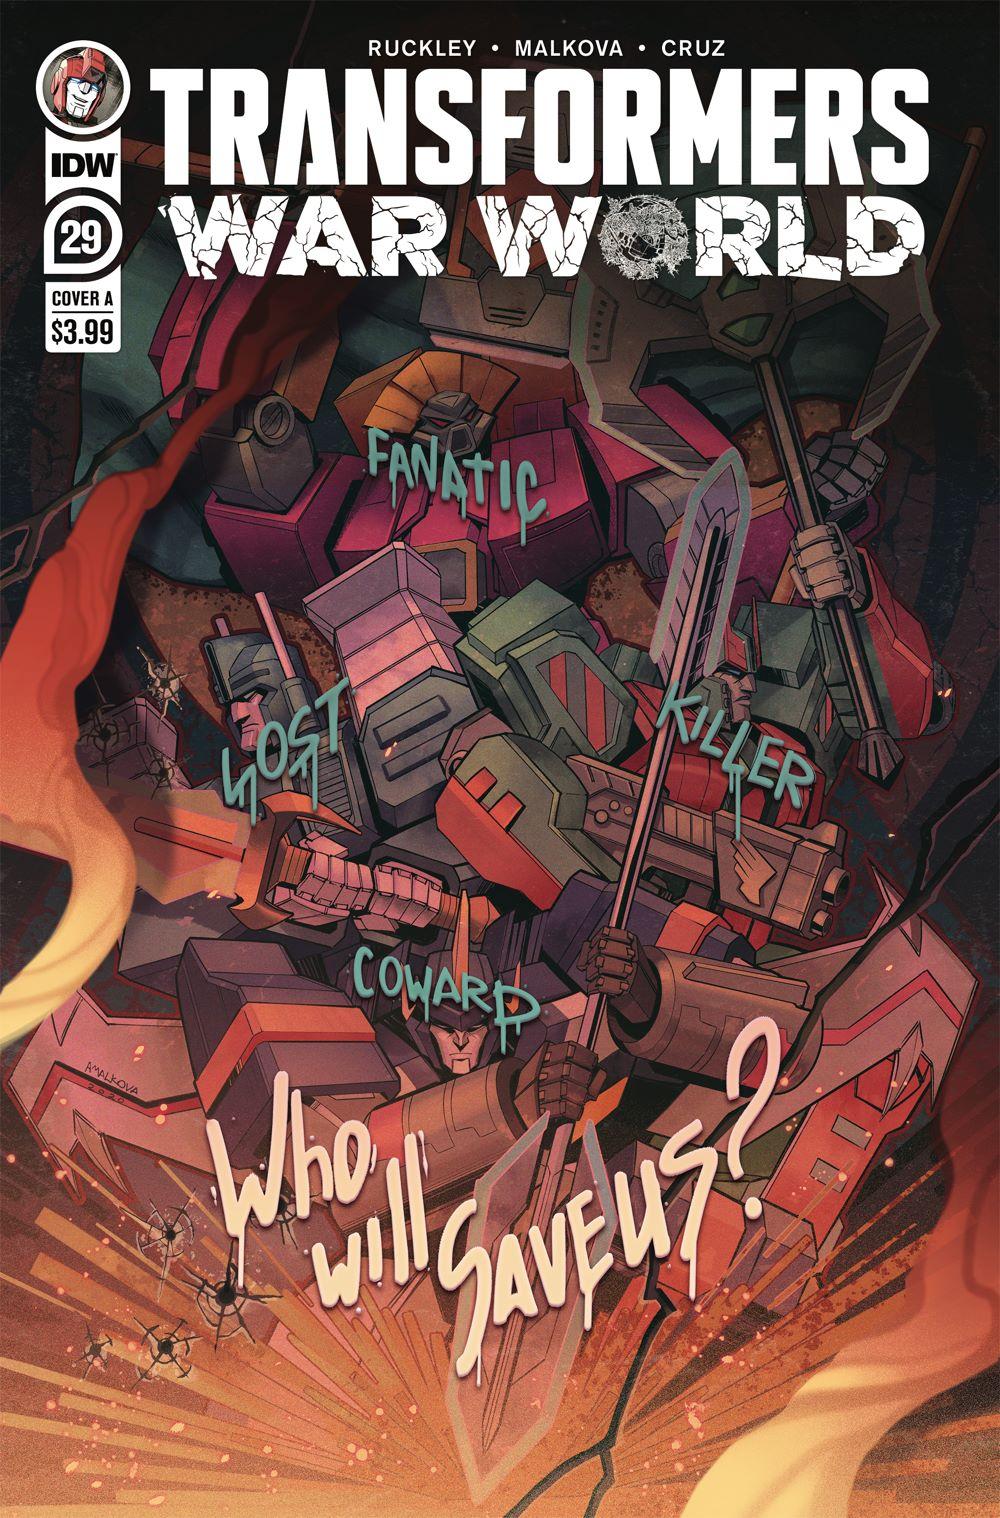 TF29-cvr-A-rev ComicList Previews: TRANSFORMERS #29